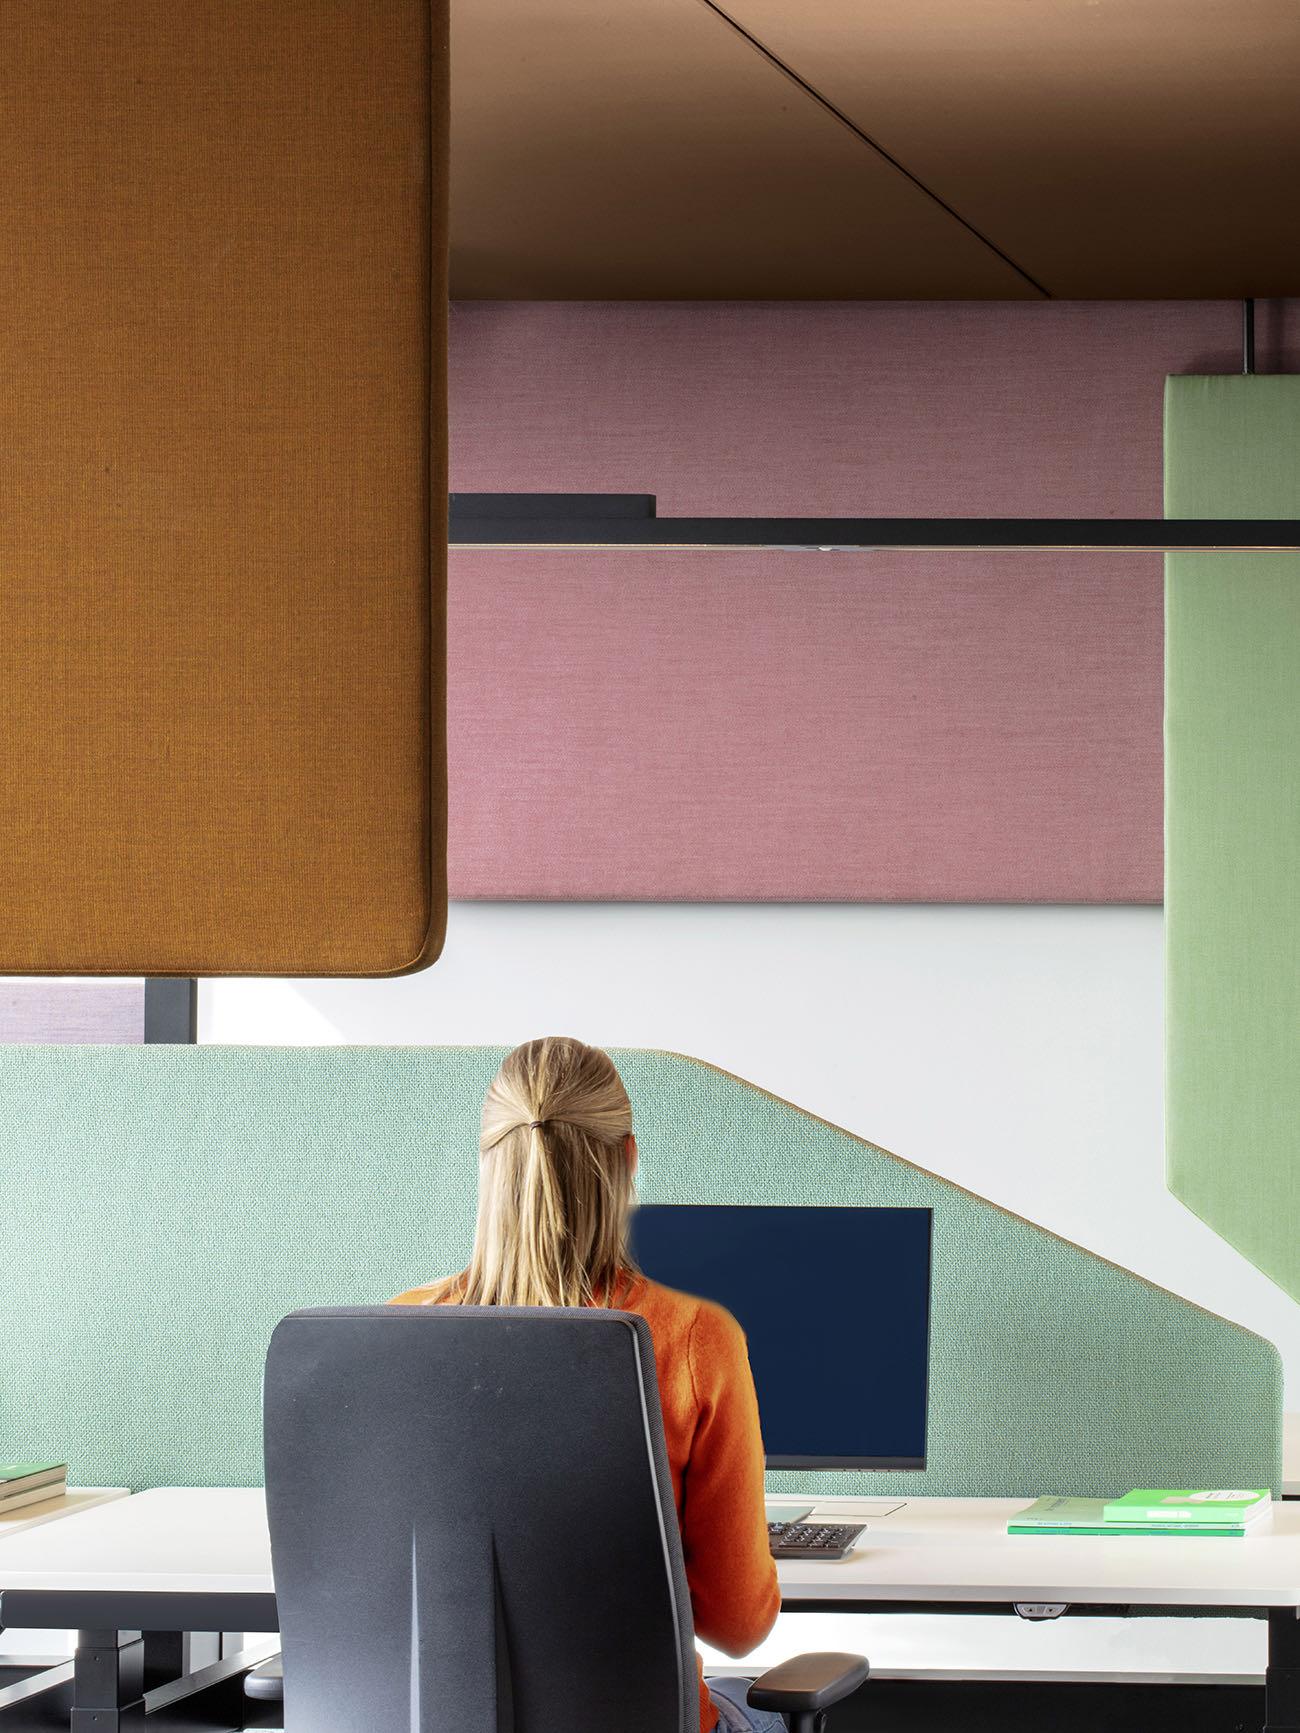 woerwag-stuttgart-office-8